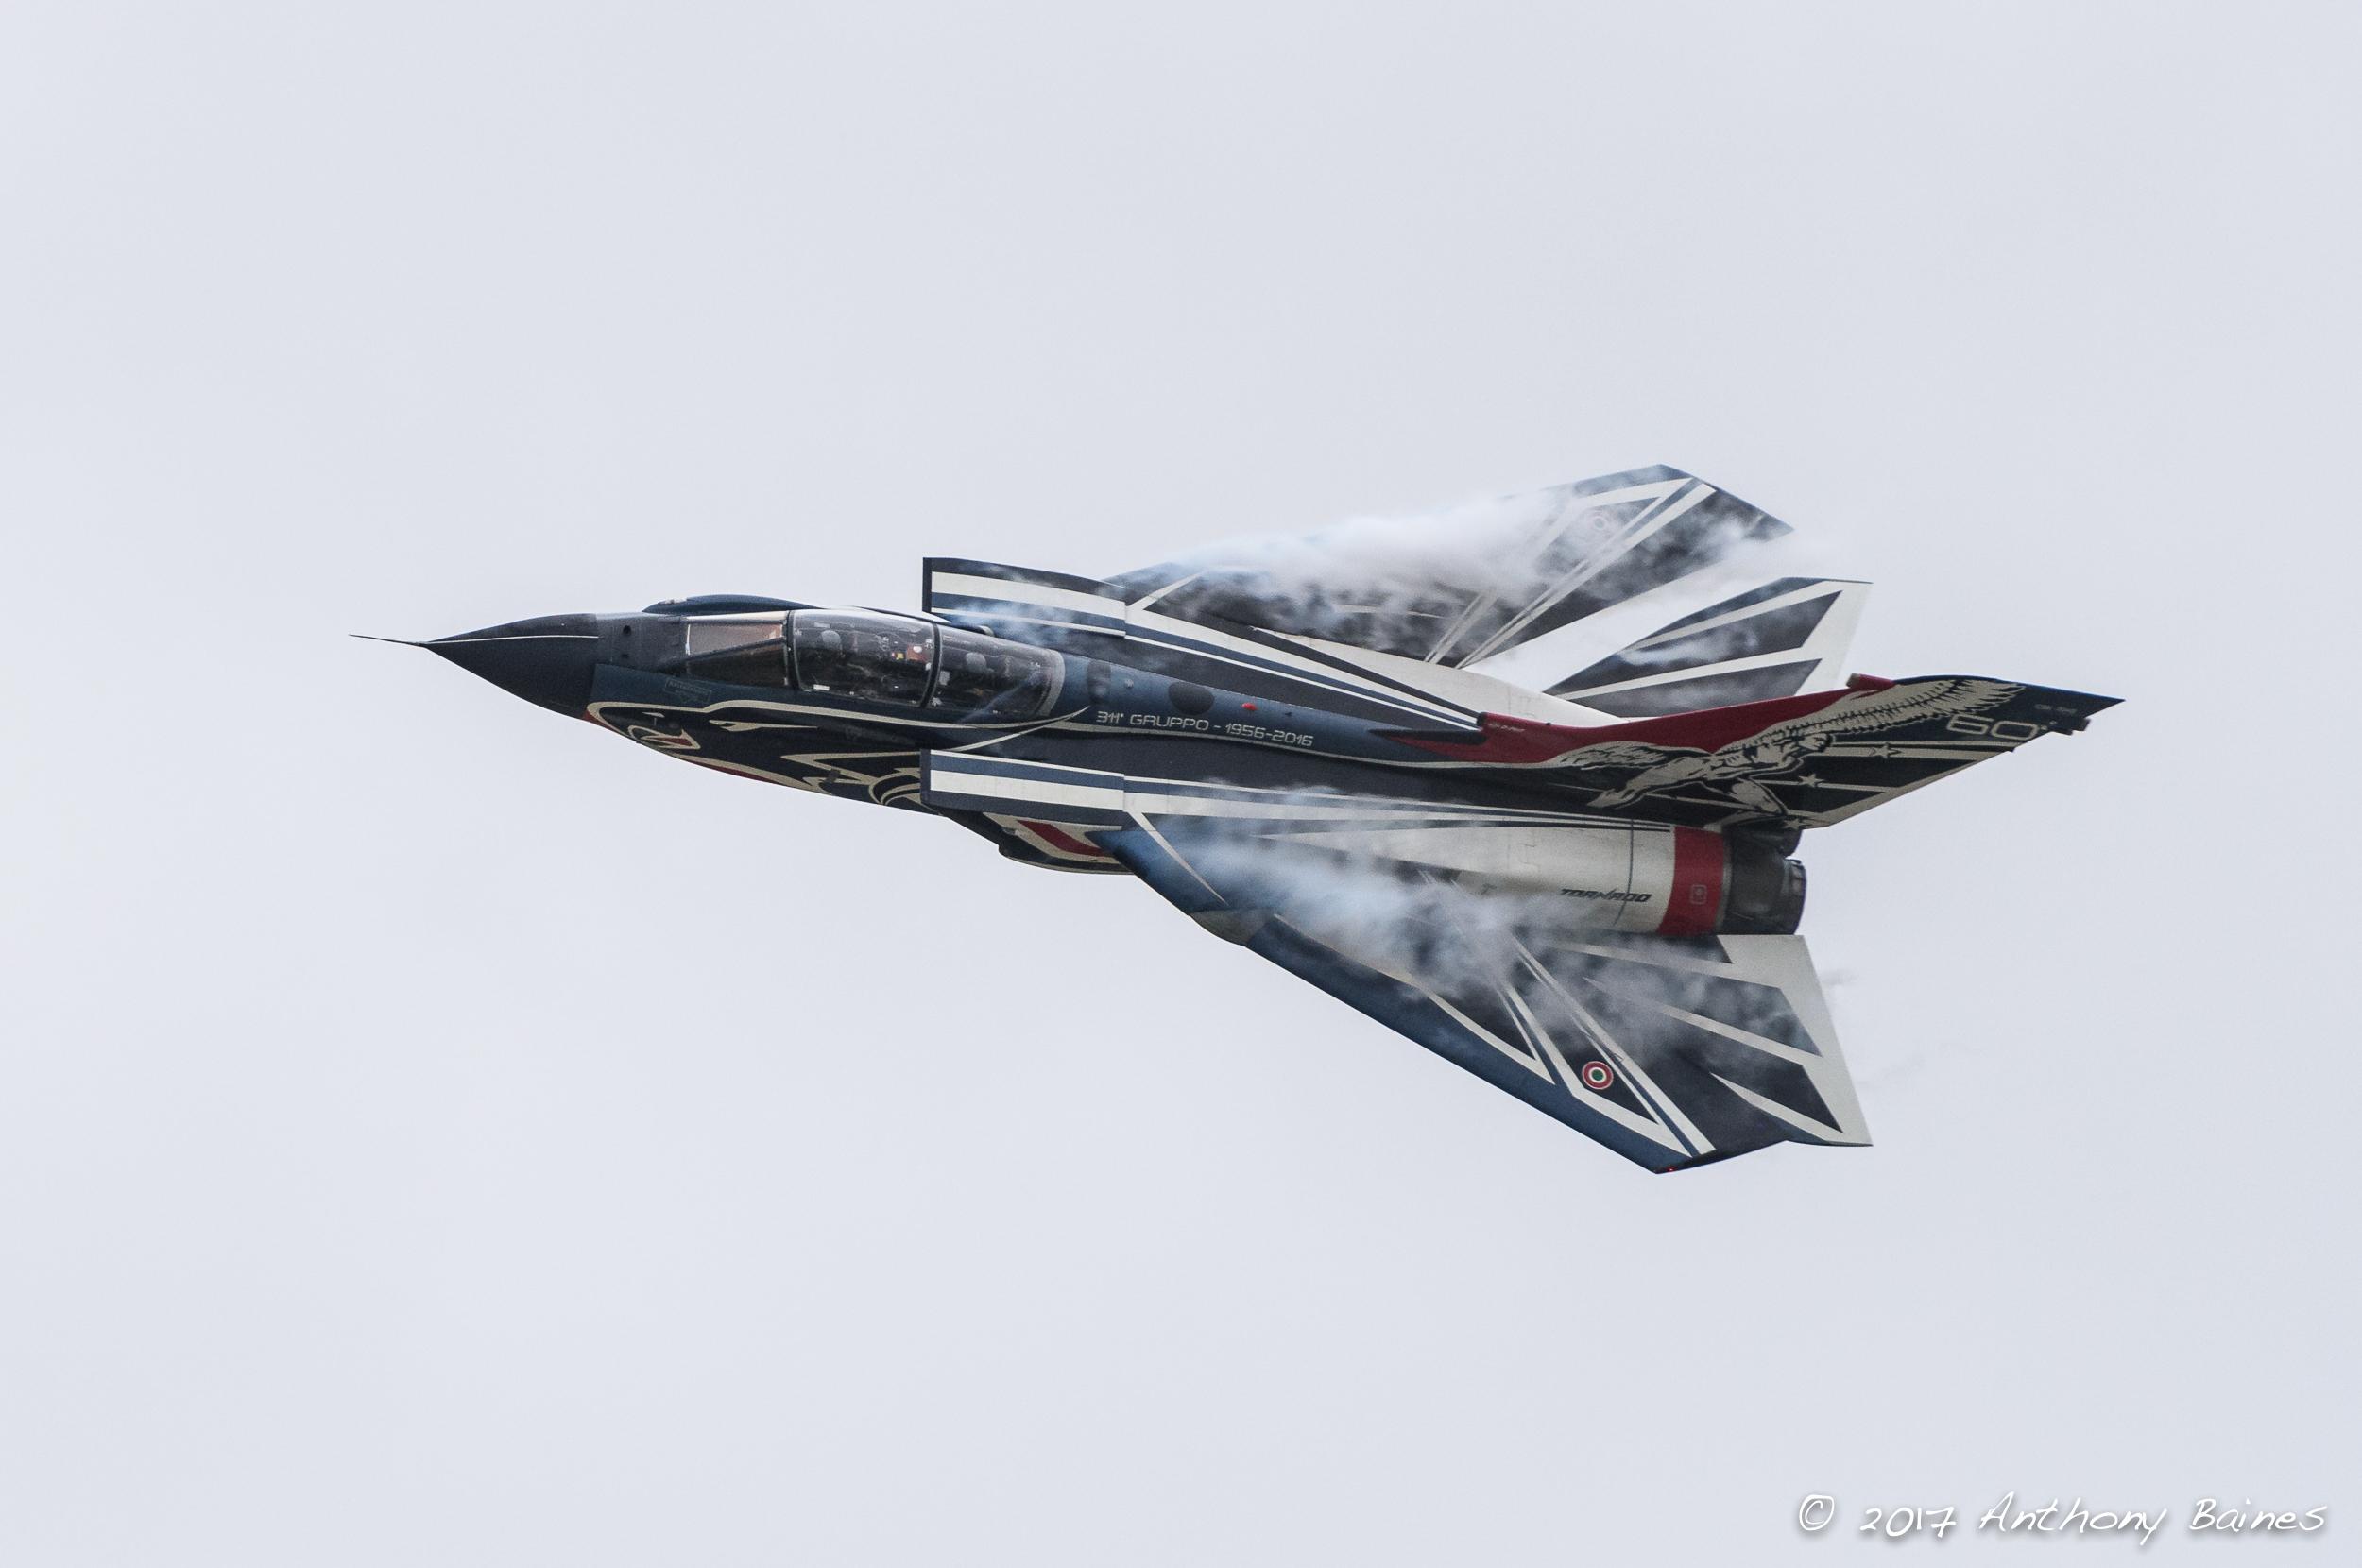 The Italian Tornado